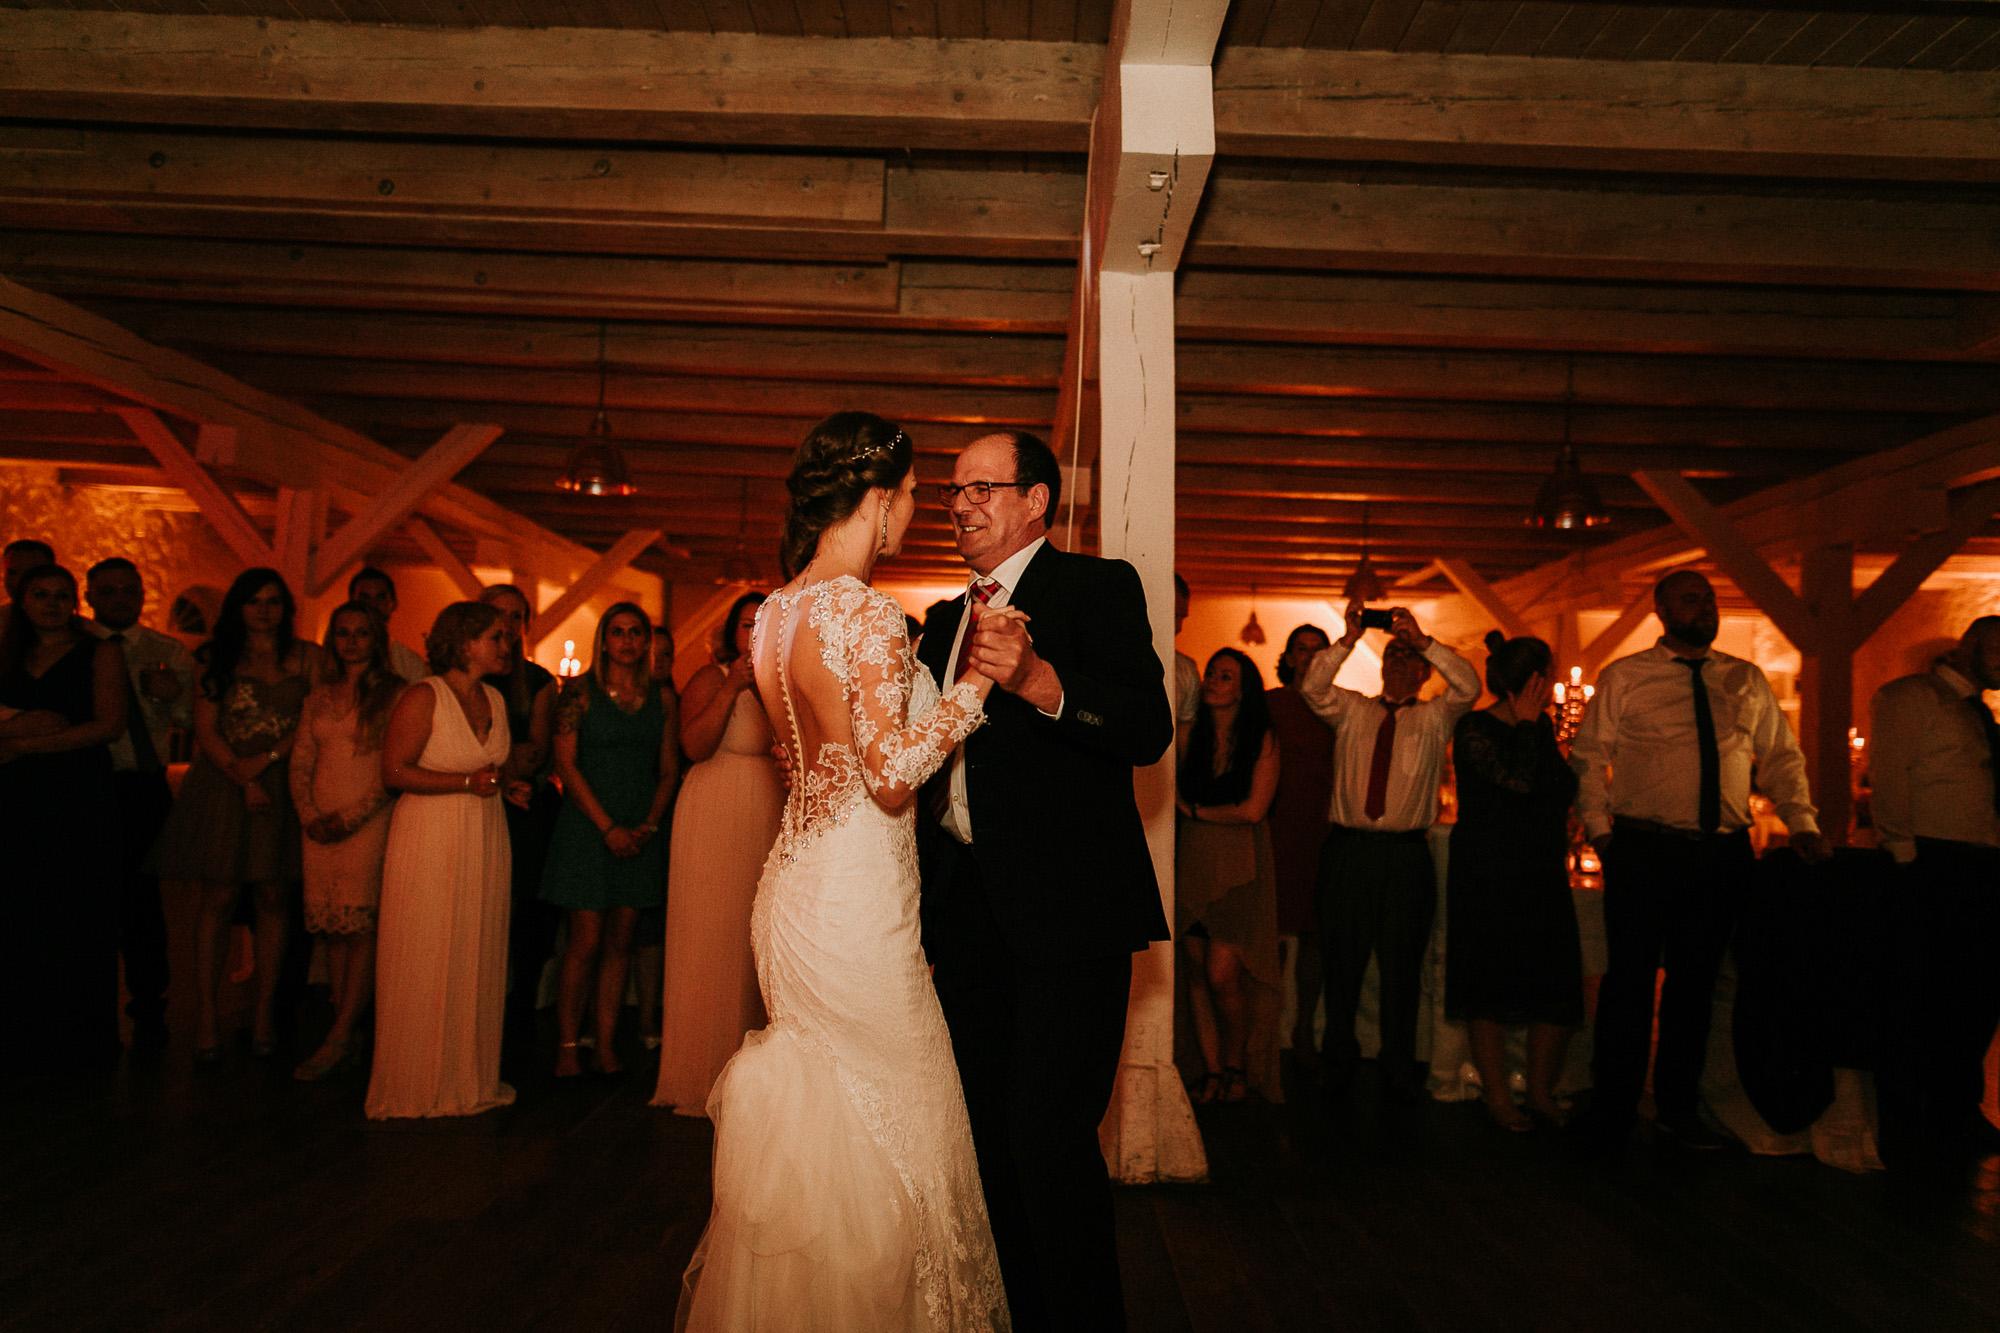 DanielaMarquardtPhotography_Hochzeitsfotograf_Düsseldorf_Köln_Mallorca_Bayern_Austria_Harz_Wedding_AileenundLennart_Weddingphotographer_Ibiza_Tuskany_Italien_Toskana_Portugal_Lissabon274